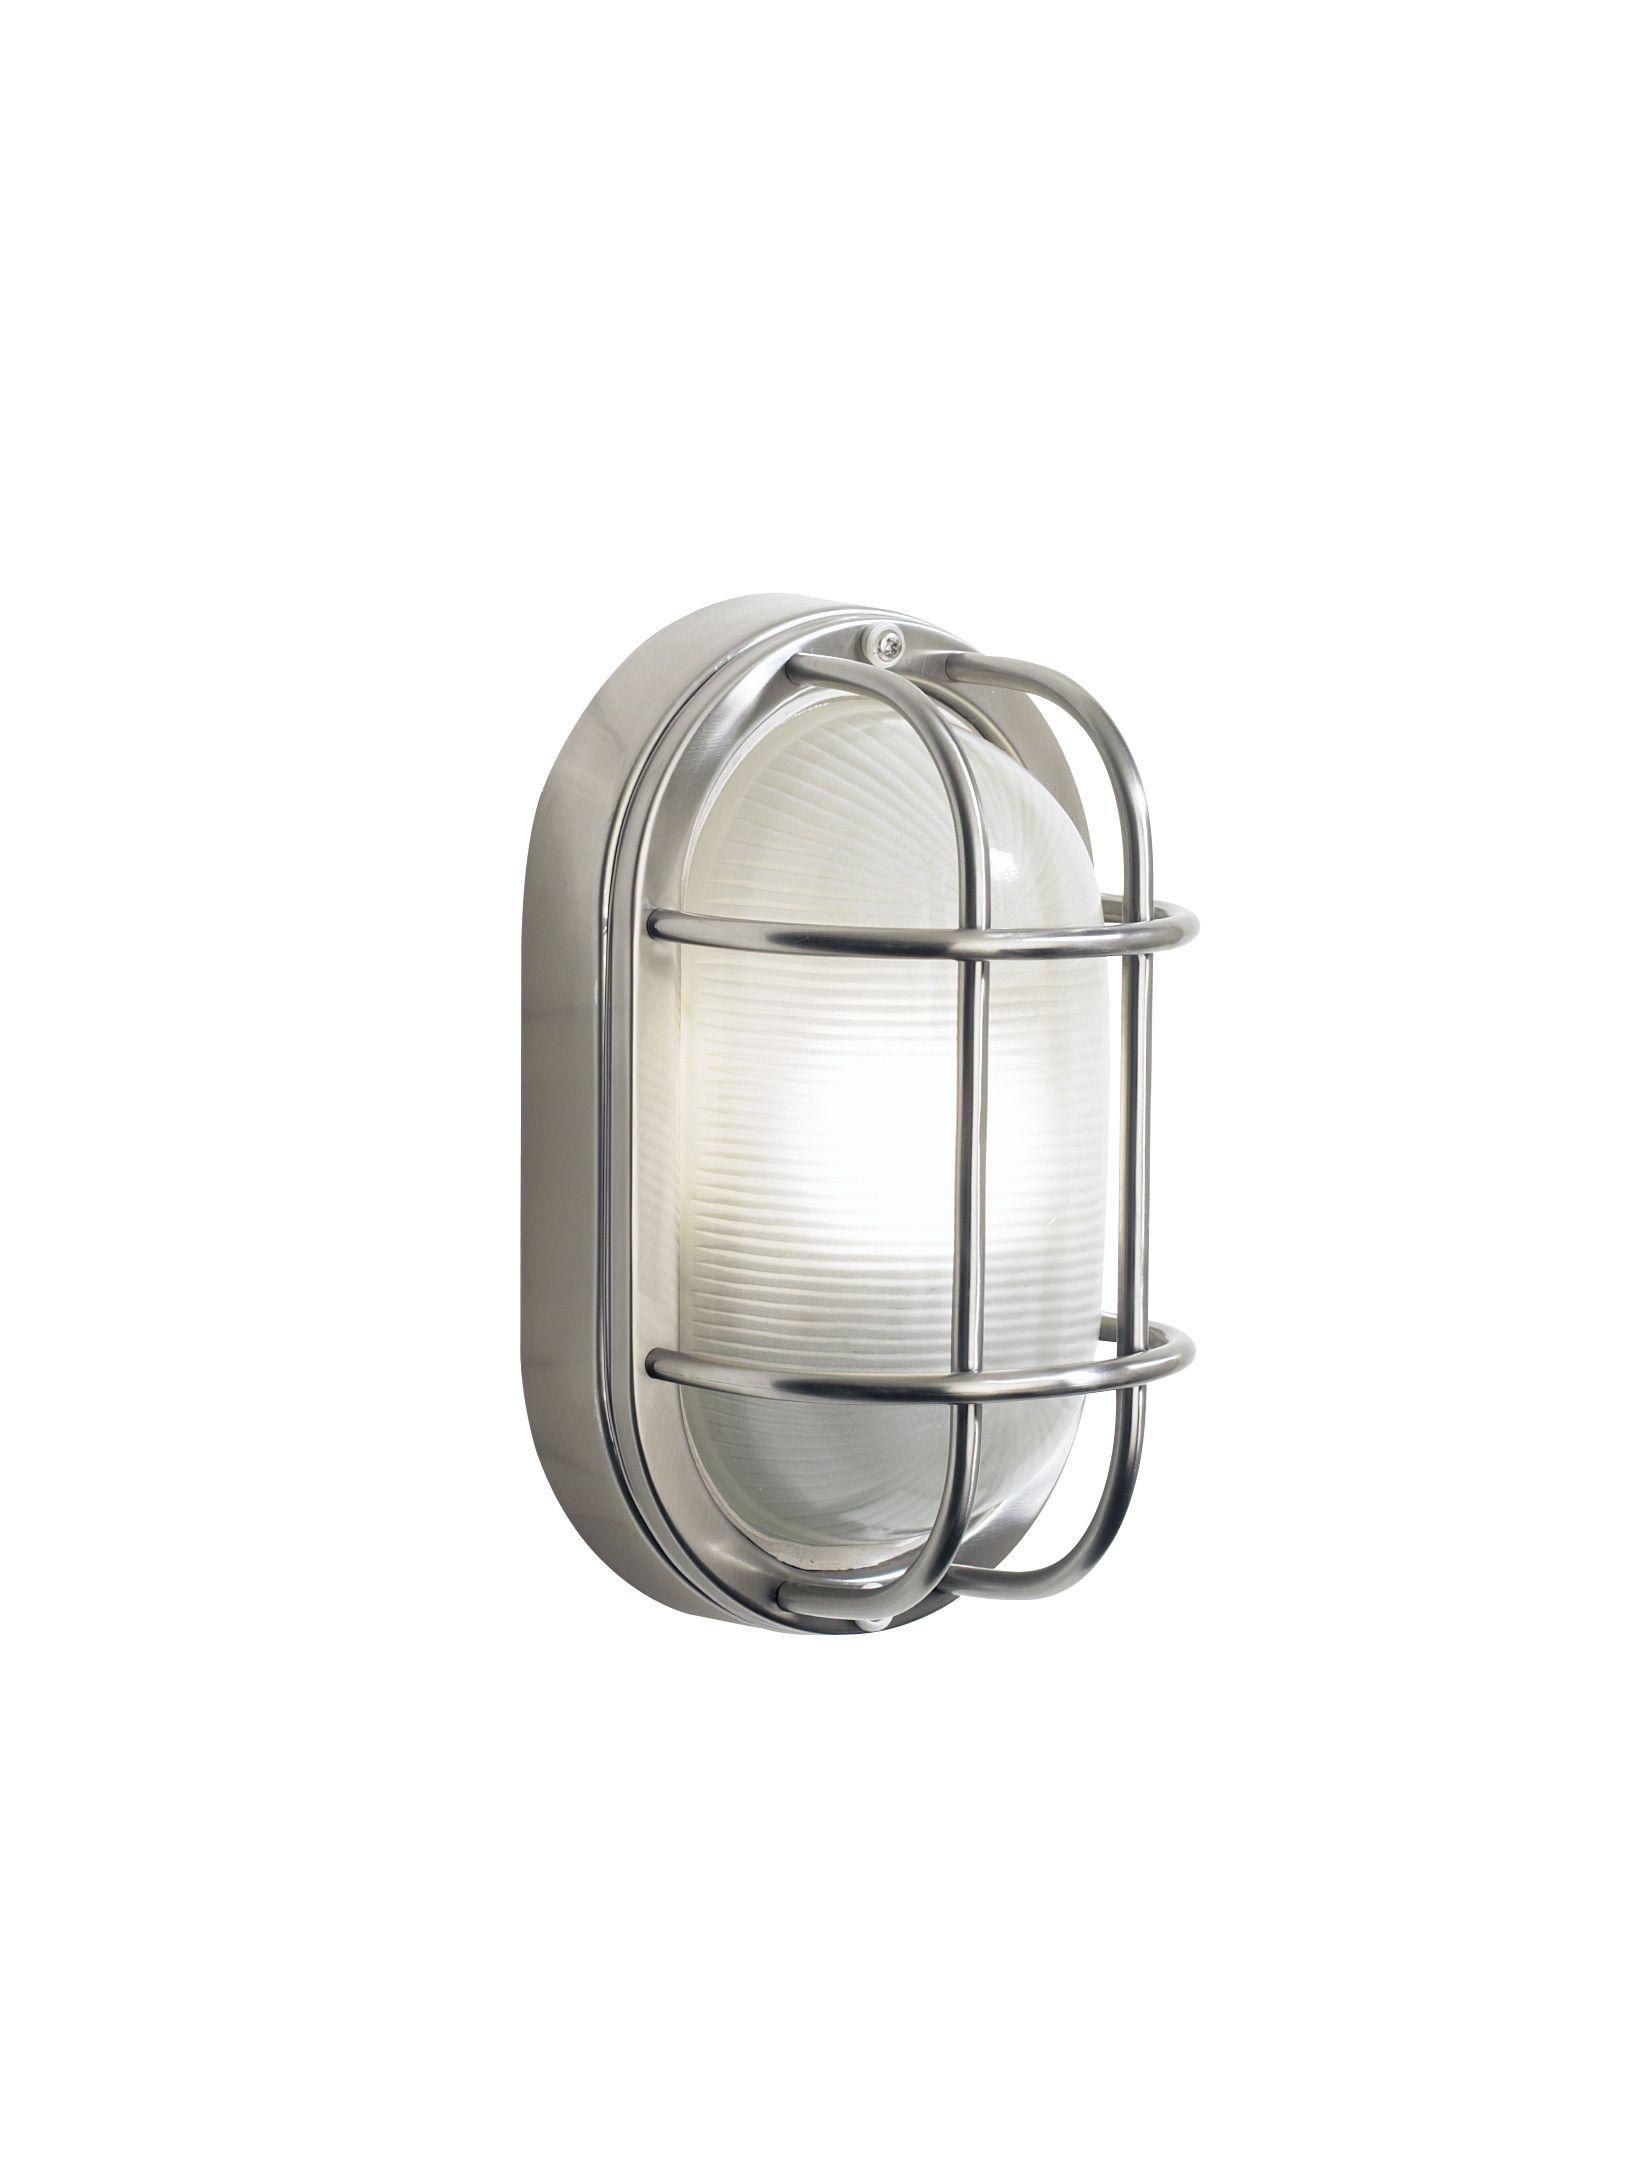 Durable Outdoor Bulkhead Oval Wall Light Wall Lights Garden Wall Lights Outdoor Wall Lighting